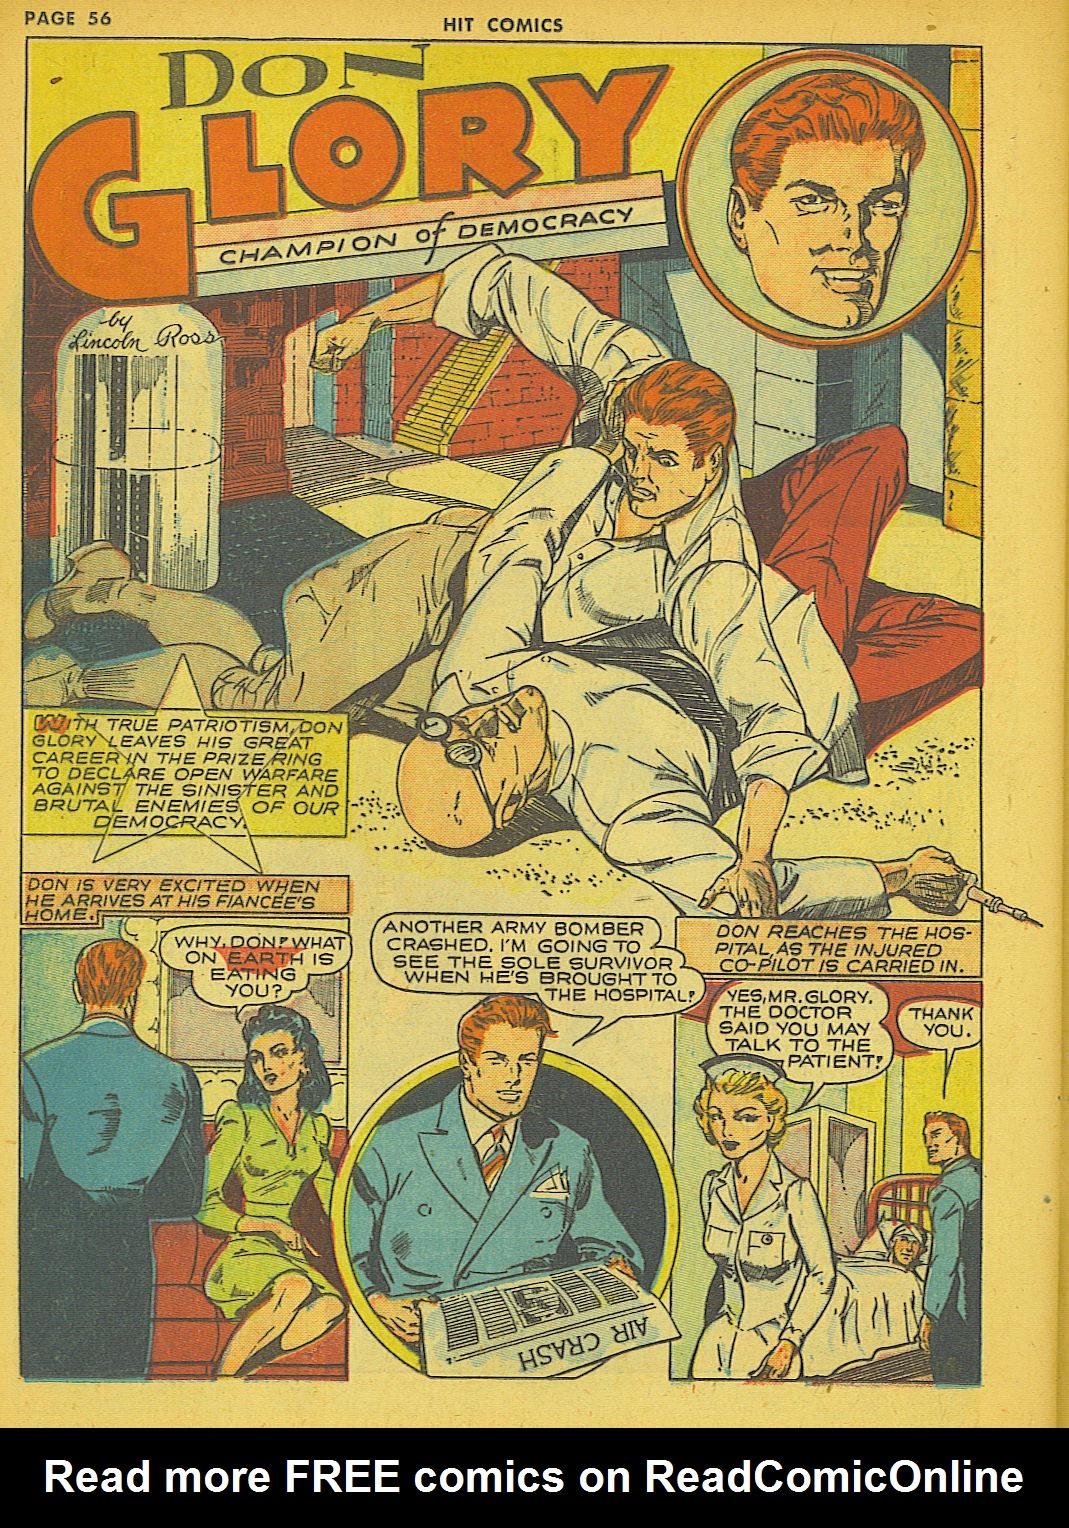 Read online Hit Comics comic -  Issue #21 - 58